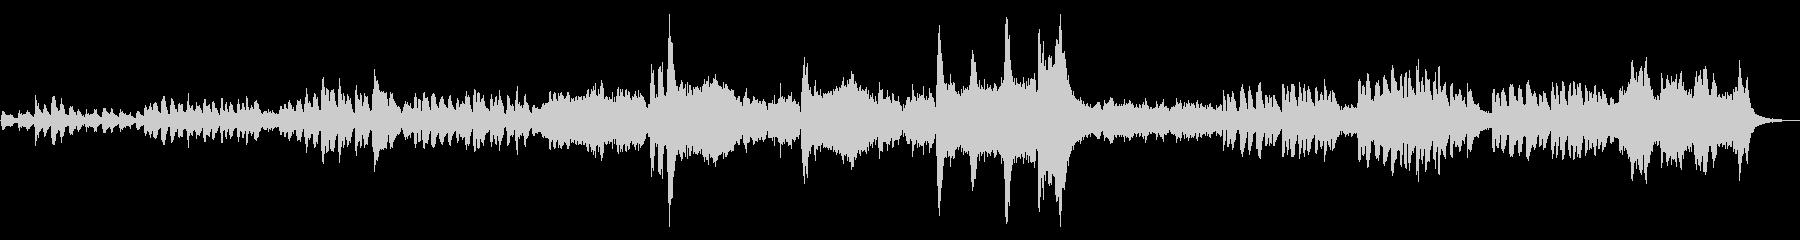 Classic Halloween comical nutcracker's unreproduced waveform